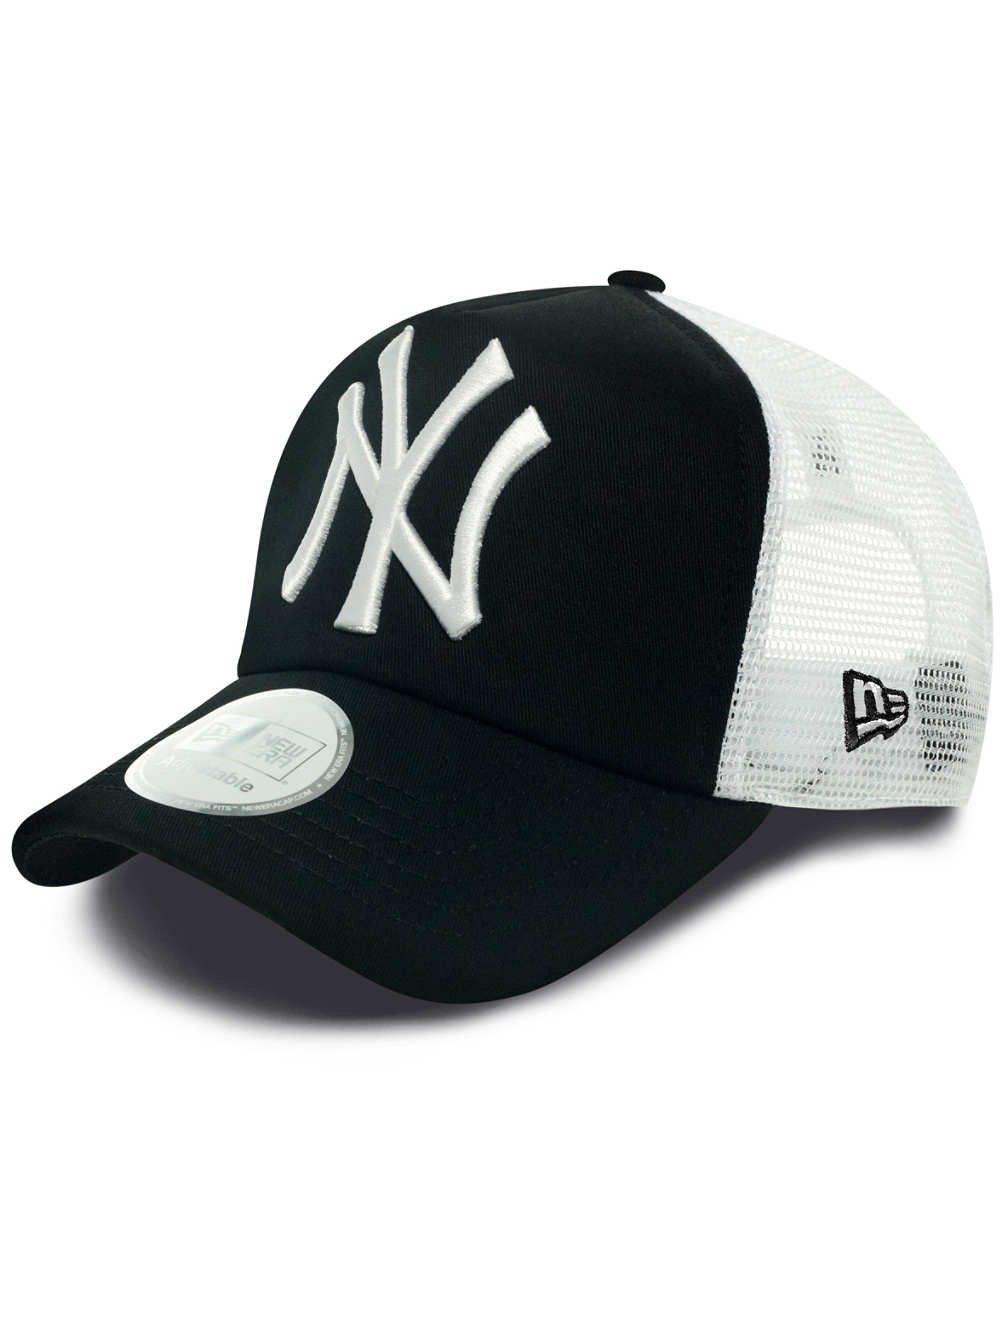 Cotton Unisex Baseball Cap Premium Quality Design and Craftsmanship by Generational Family Sportswear Brand 47 MLB New York Yankees MVP Cap